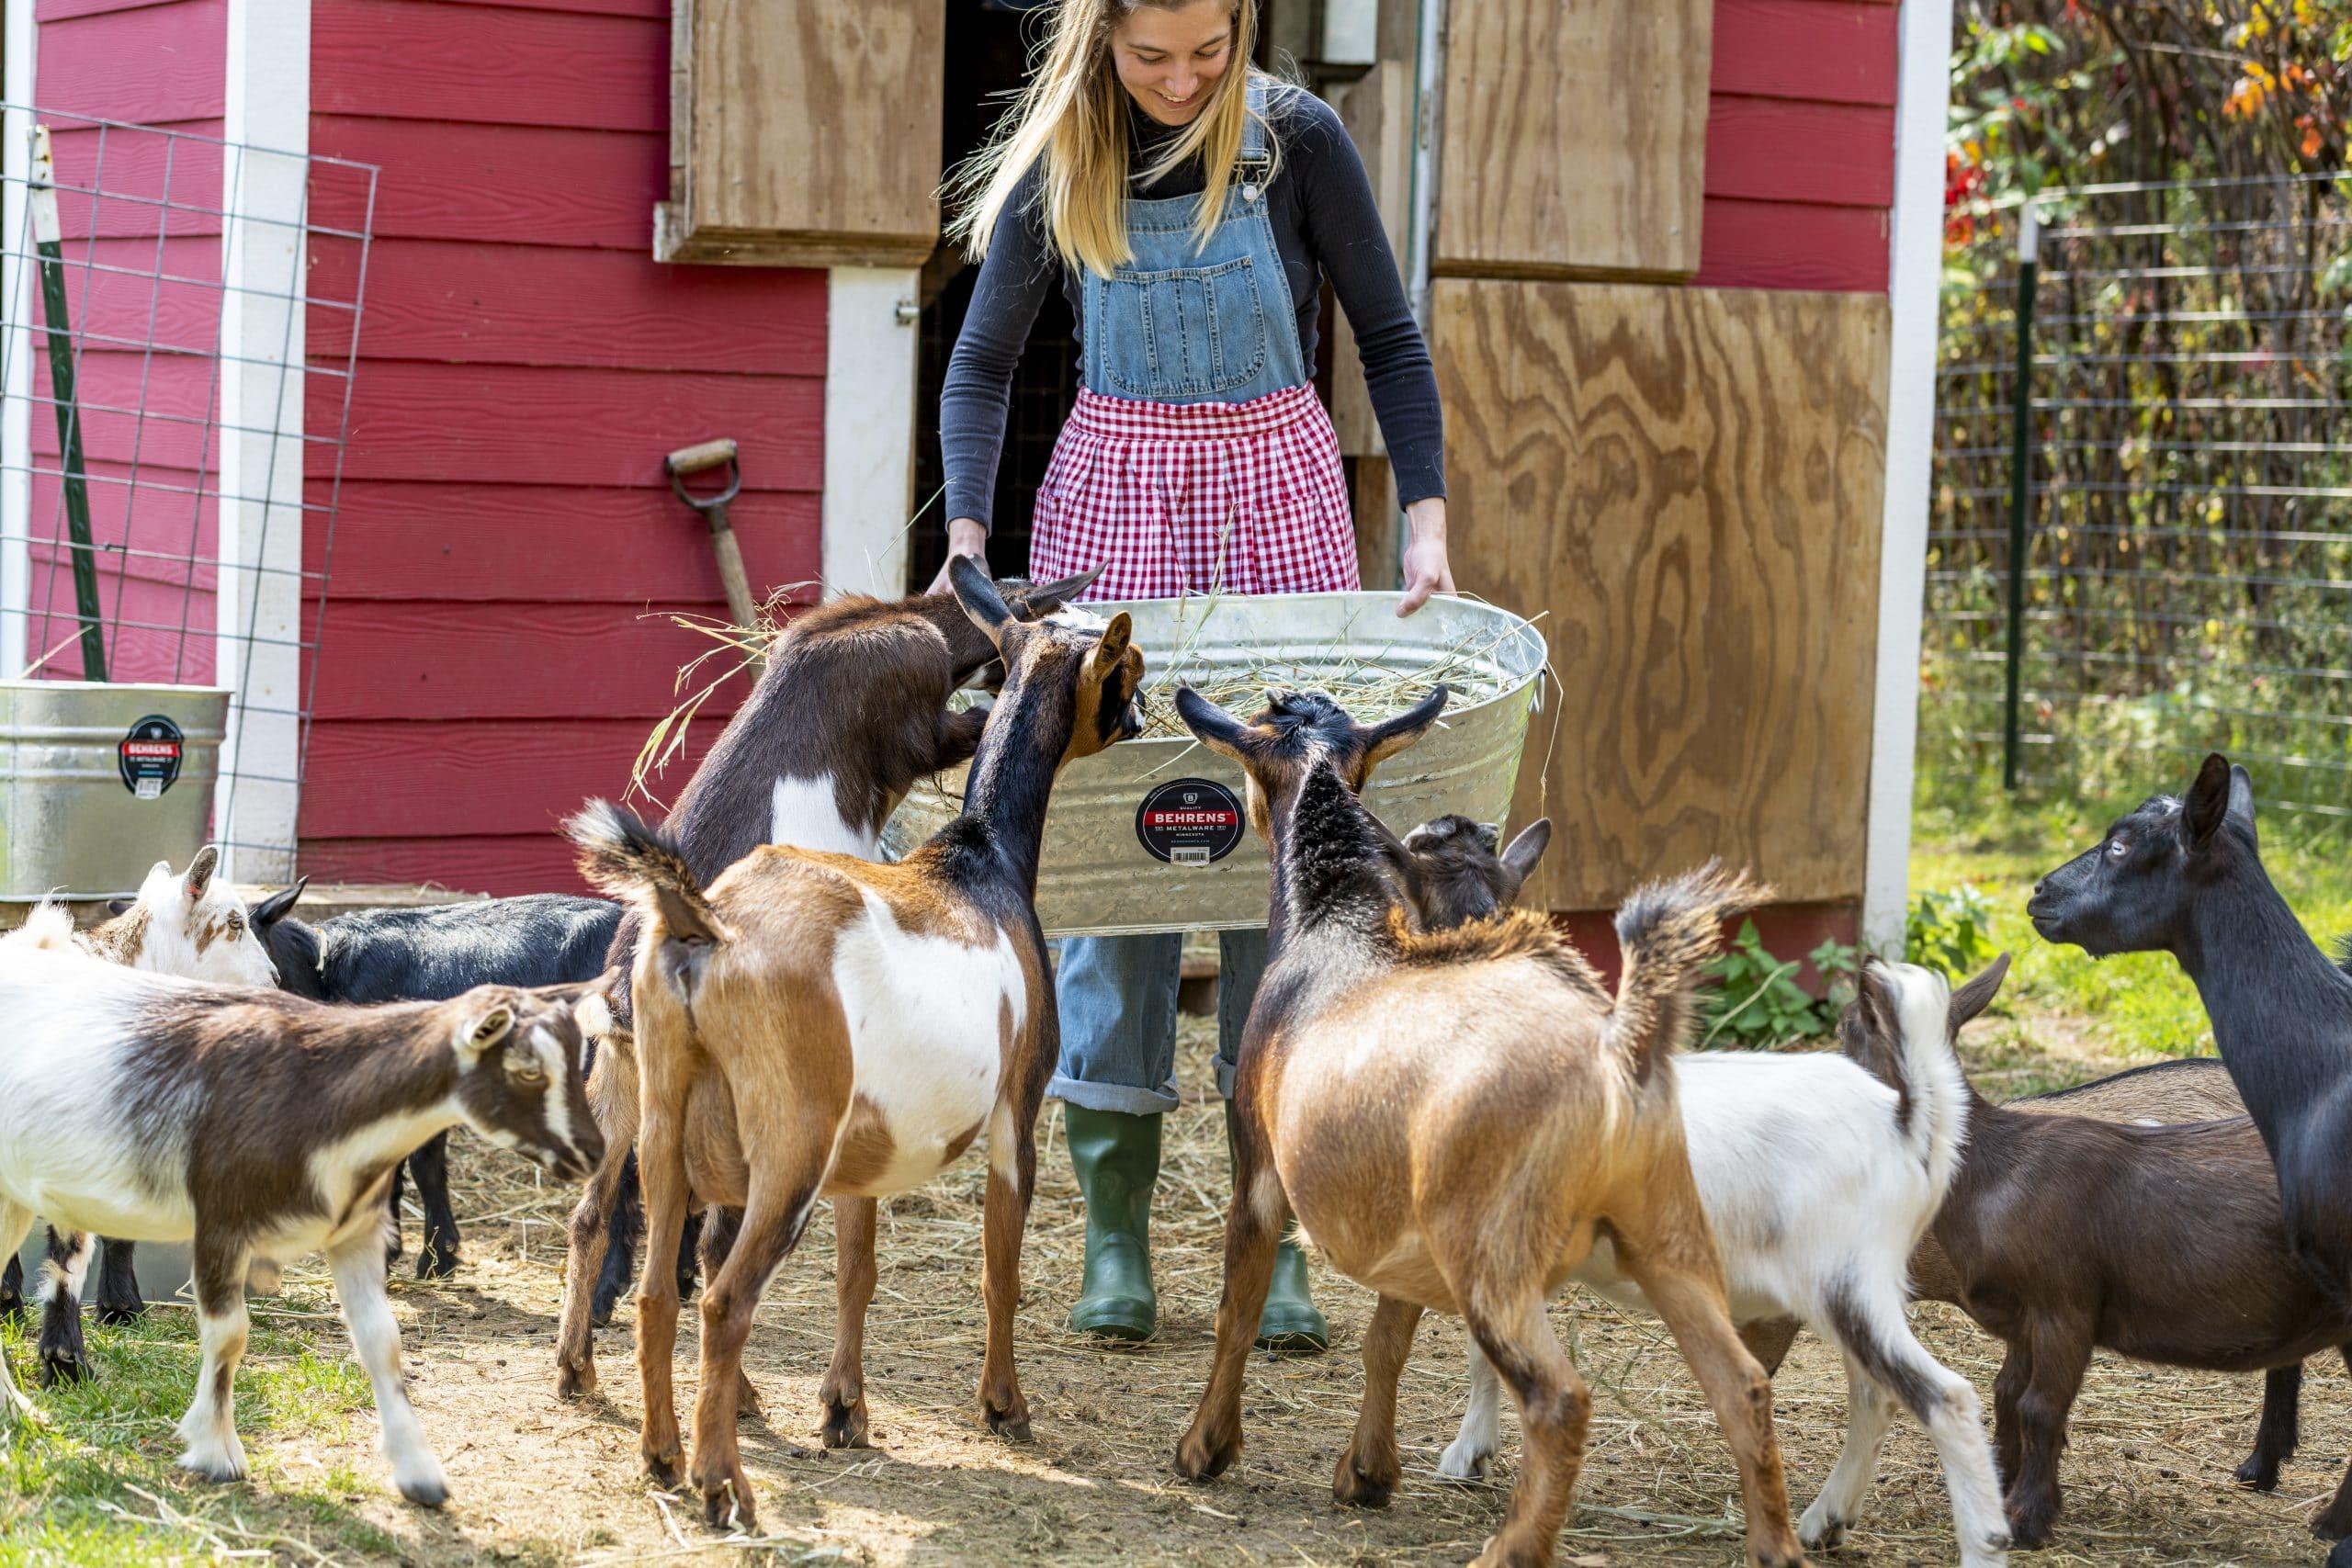 Woman holding galvanized tub feeding goats on hobby farm